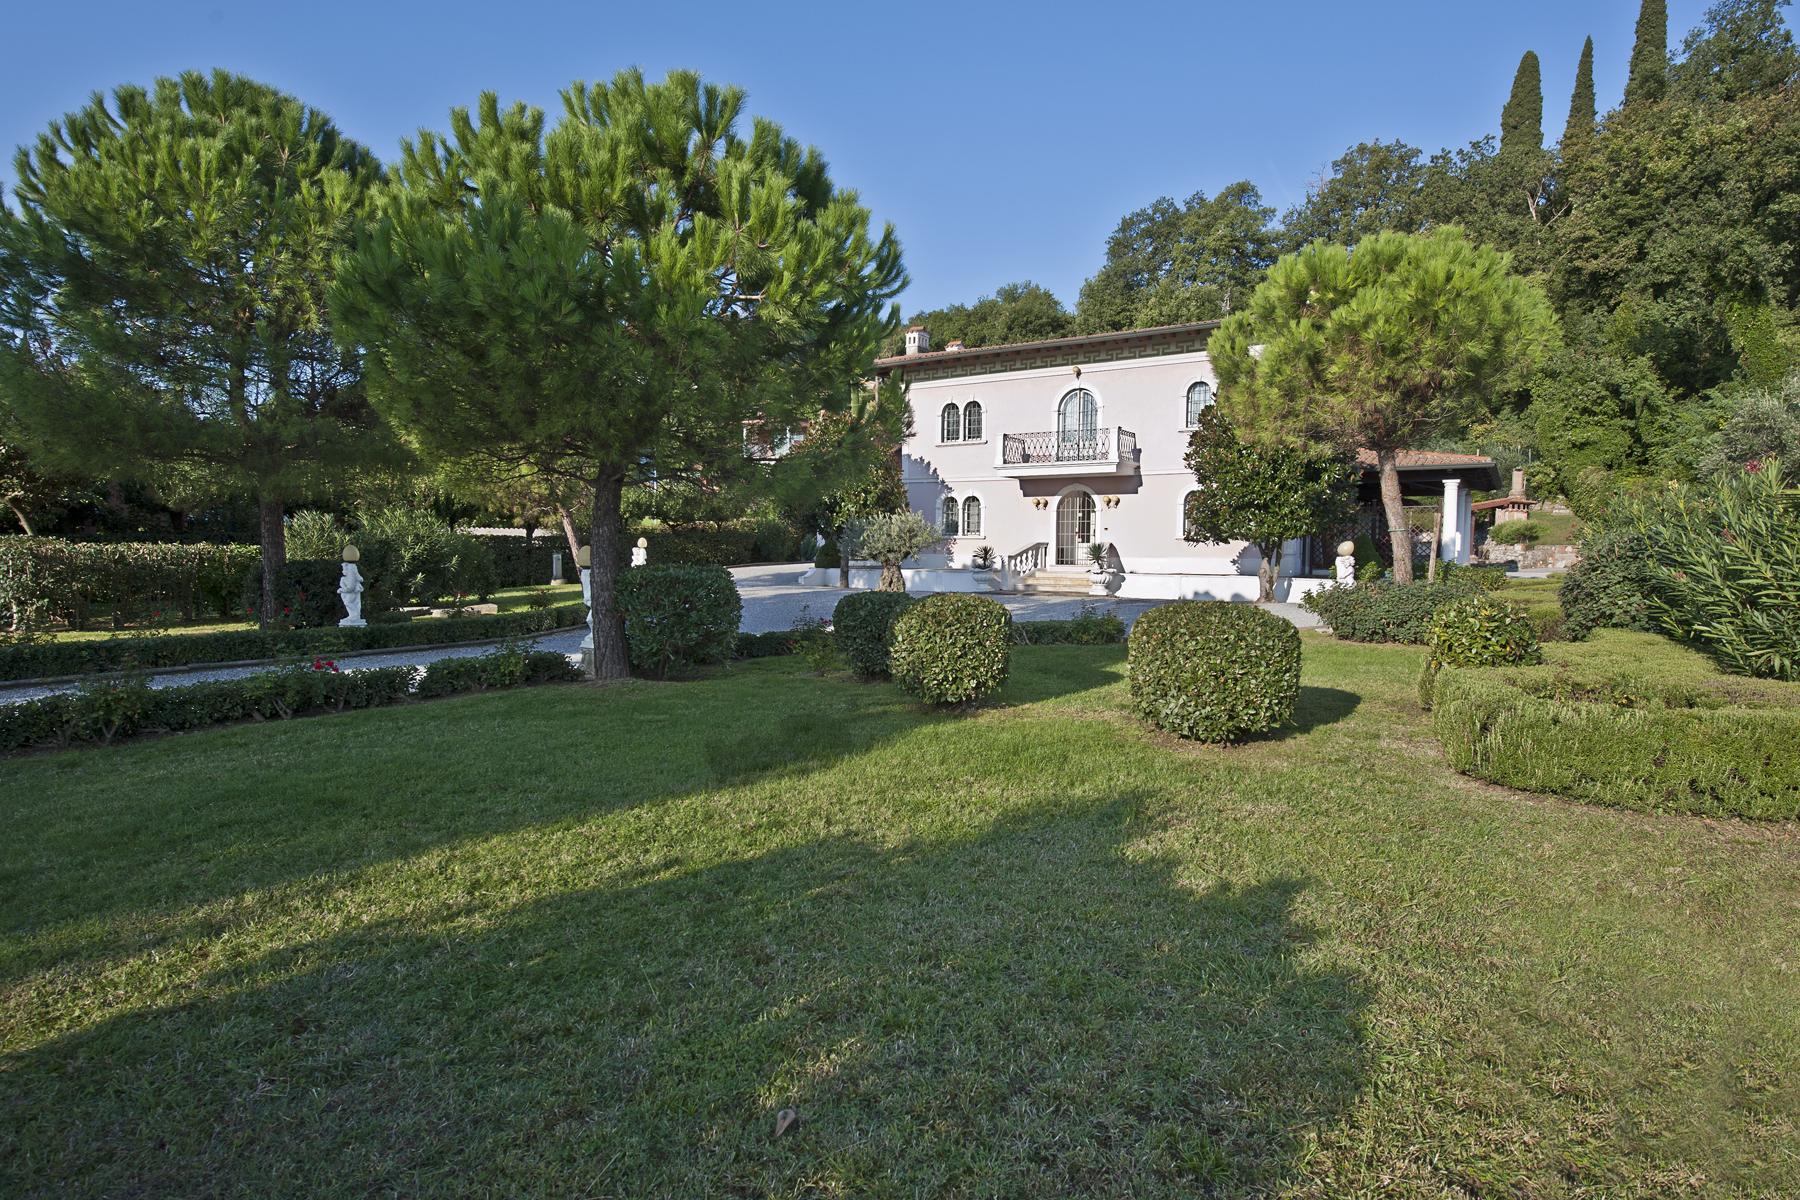 Villa in Vendita a Padenghe Sul Garda: 5 locali, 400 mq - Foto 4